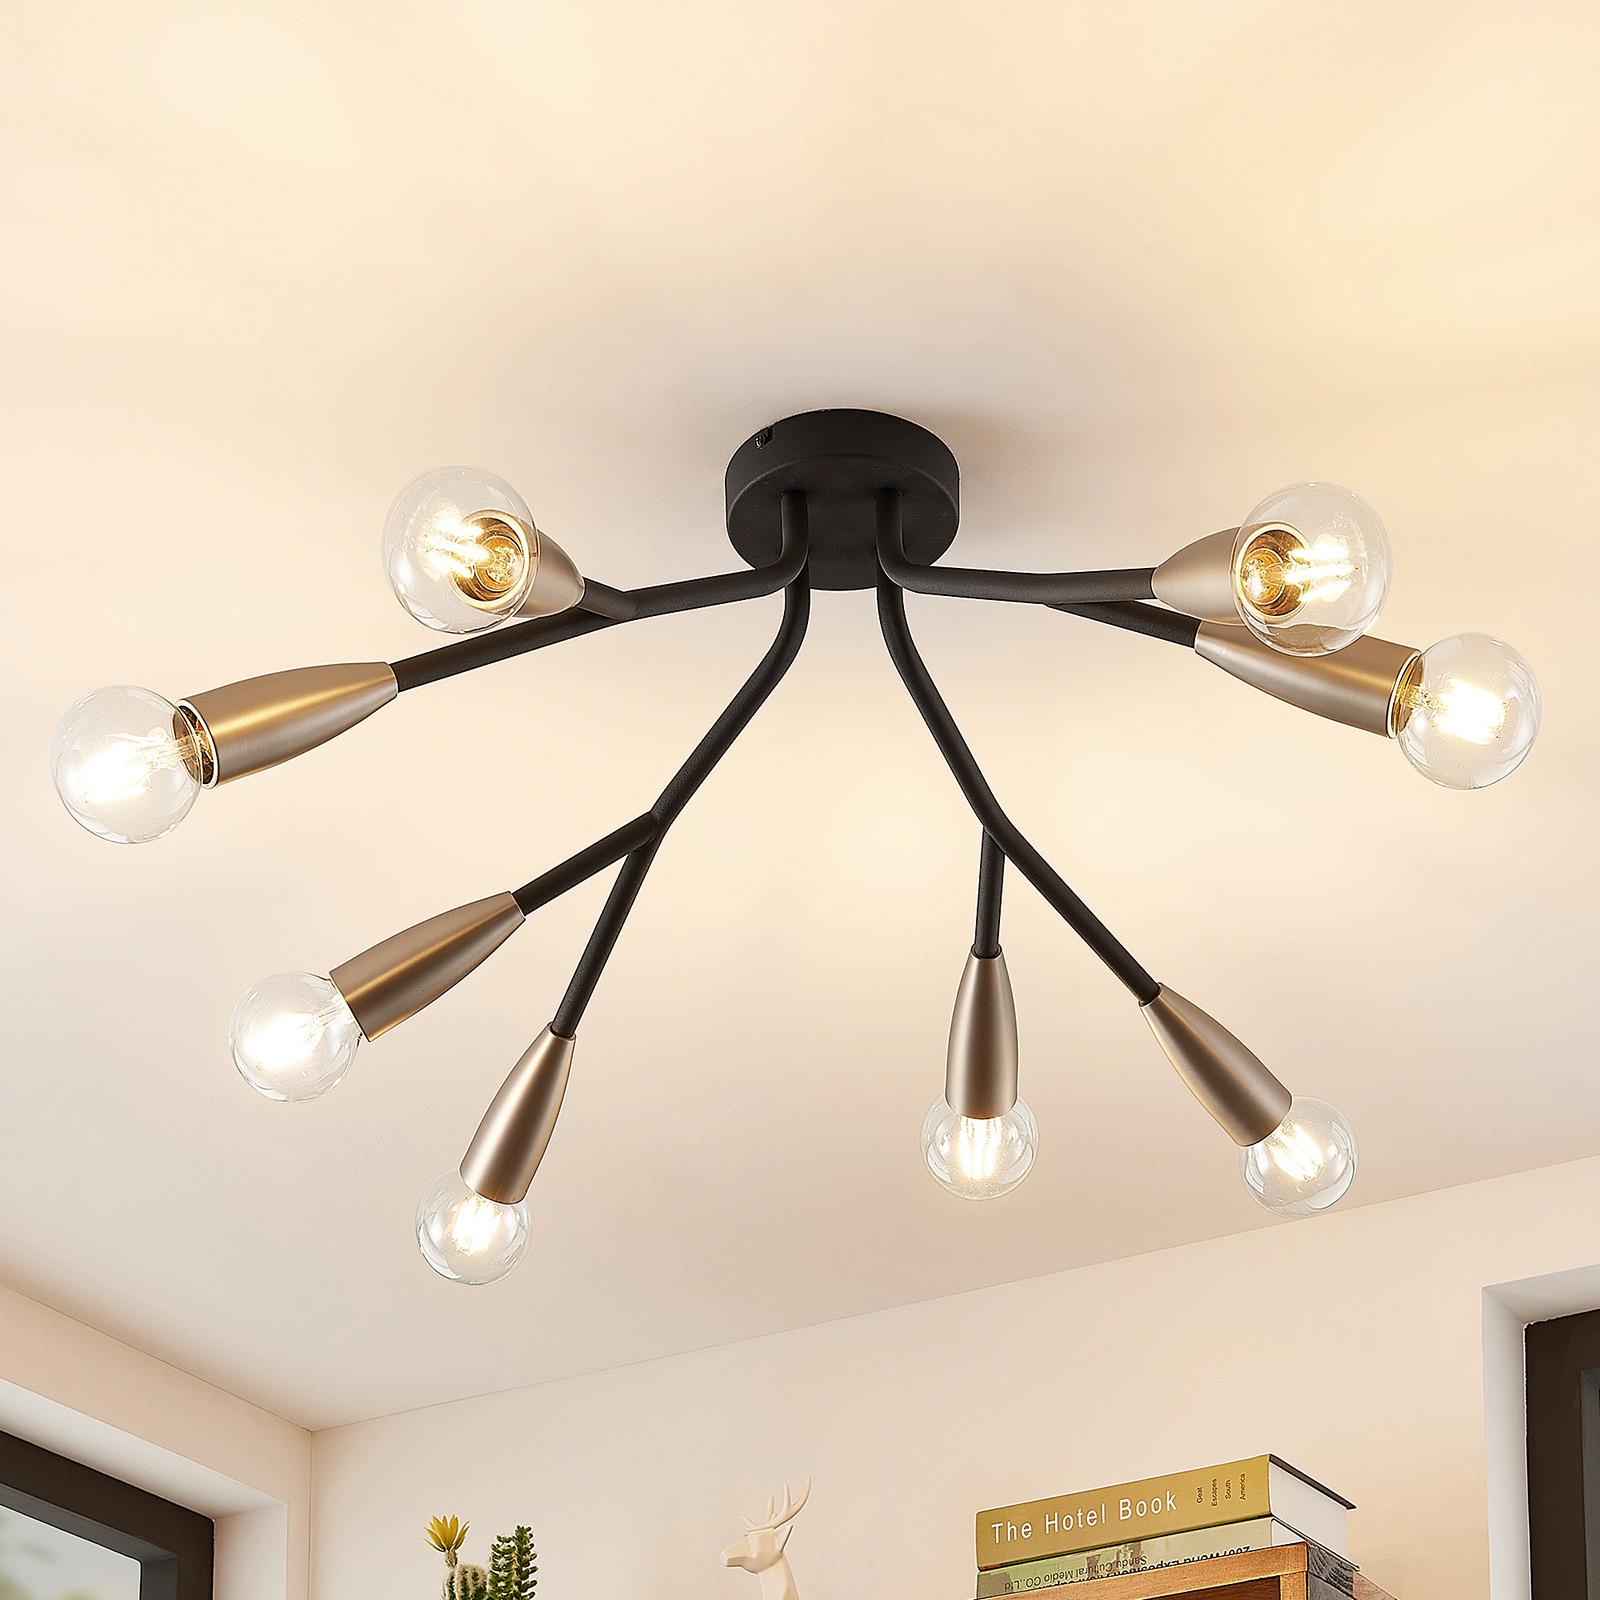 Lucande Carlea plafondlamp, 8-lamps zwart-nikkel